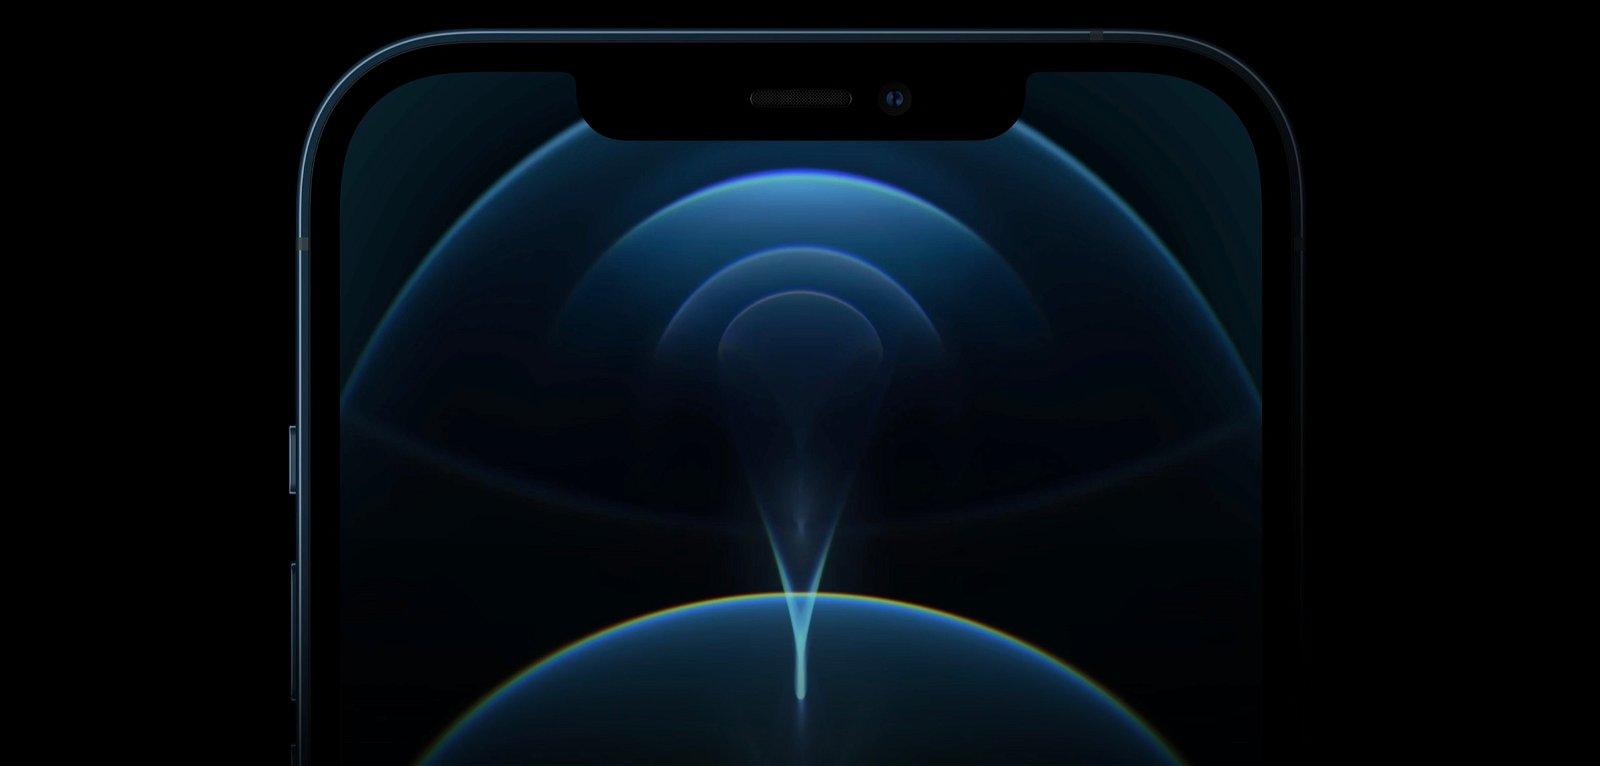 iPhone 12 Pro frontal pantalla